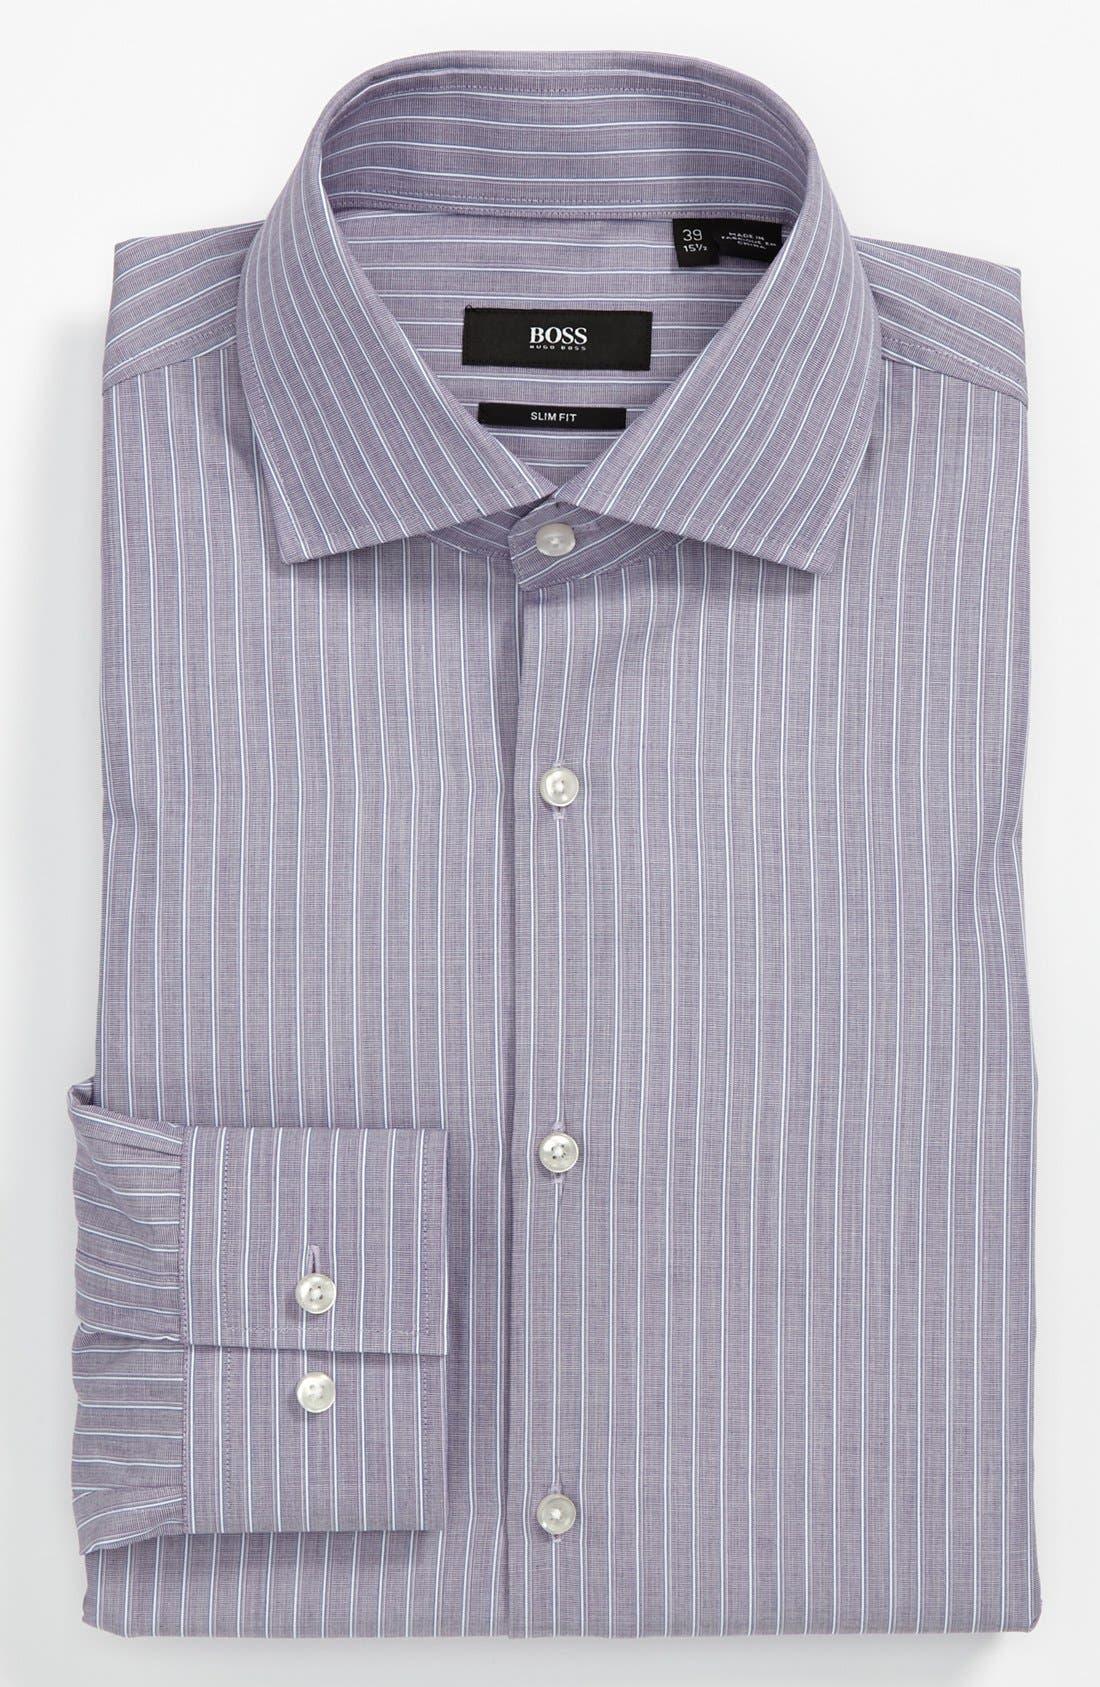 Main Image - BOSS HUGO BOSS 'Jaron' Slim Fit Dress Shirt